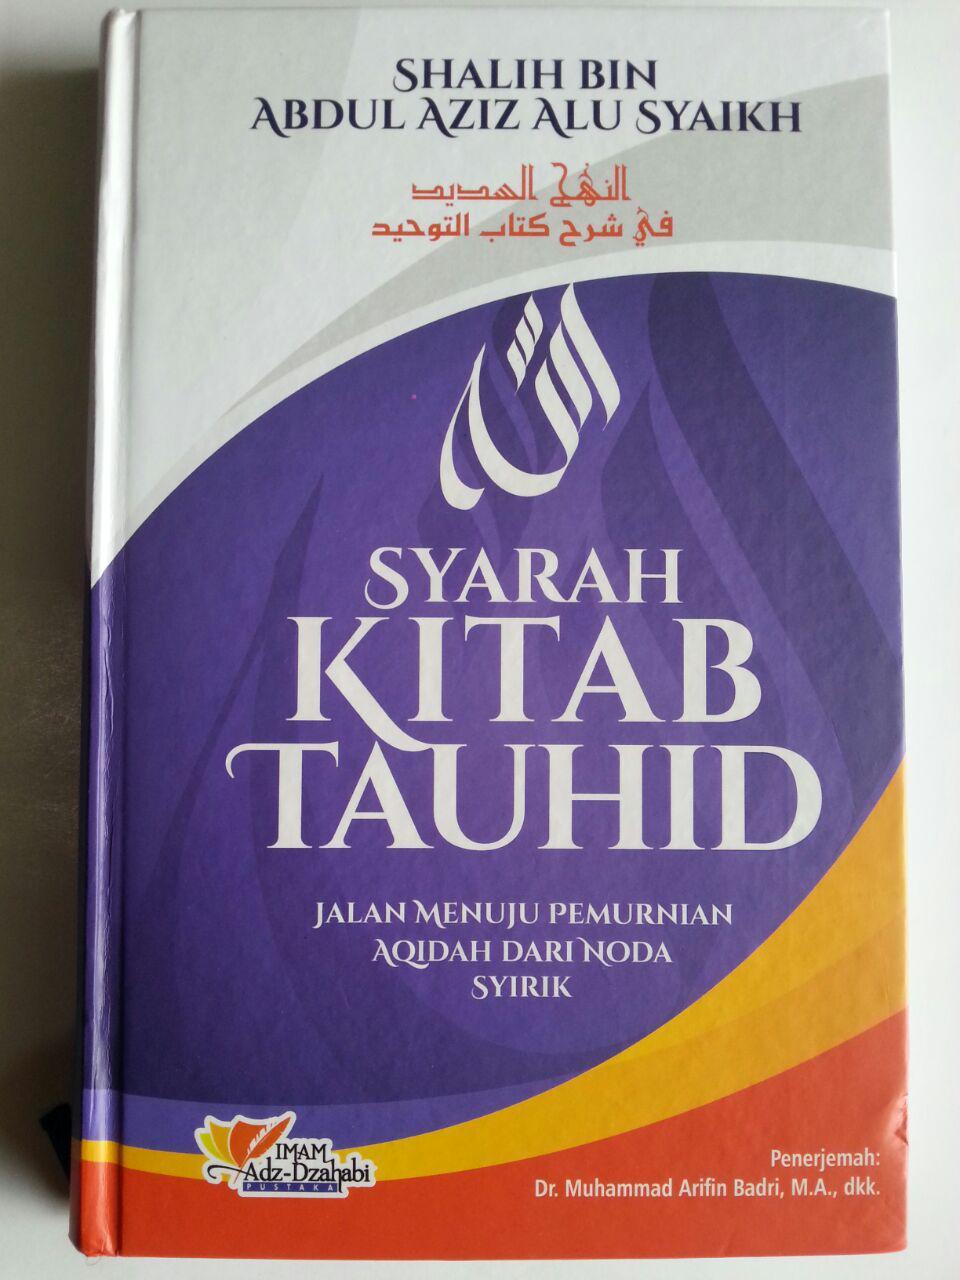 Buku Syarah Kitab Tauhid Jalan Menuju Permurnian Aqidah cover 2